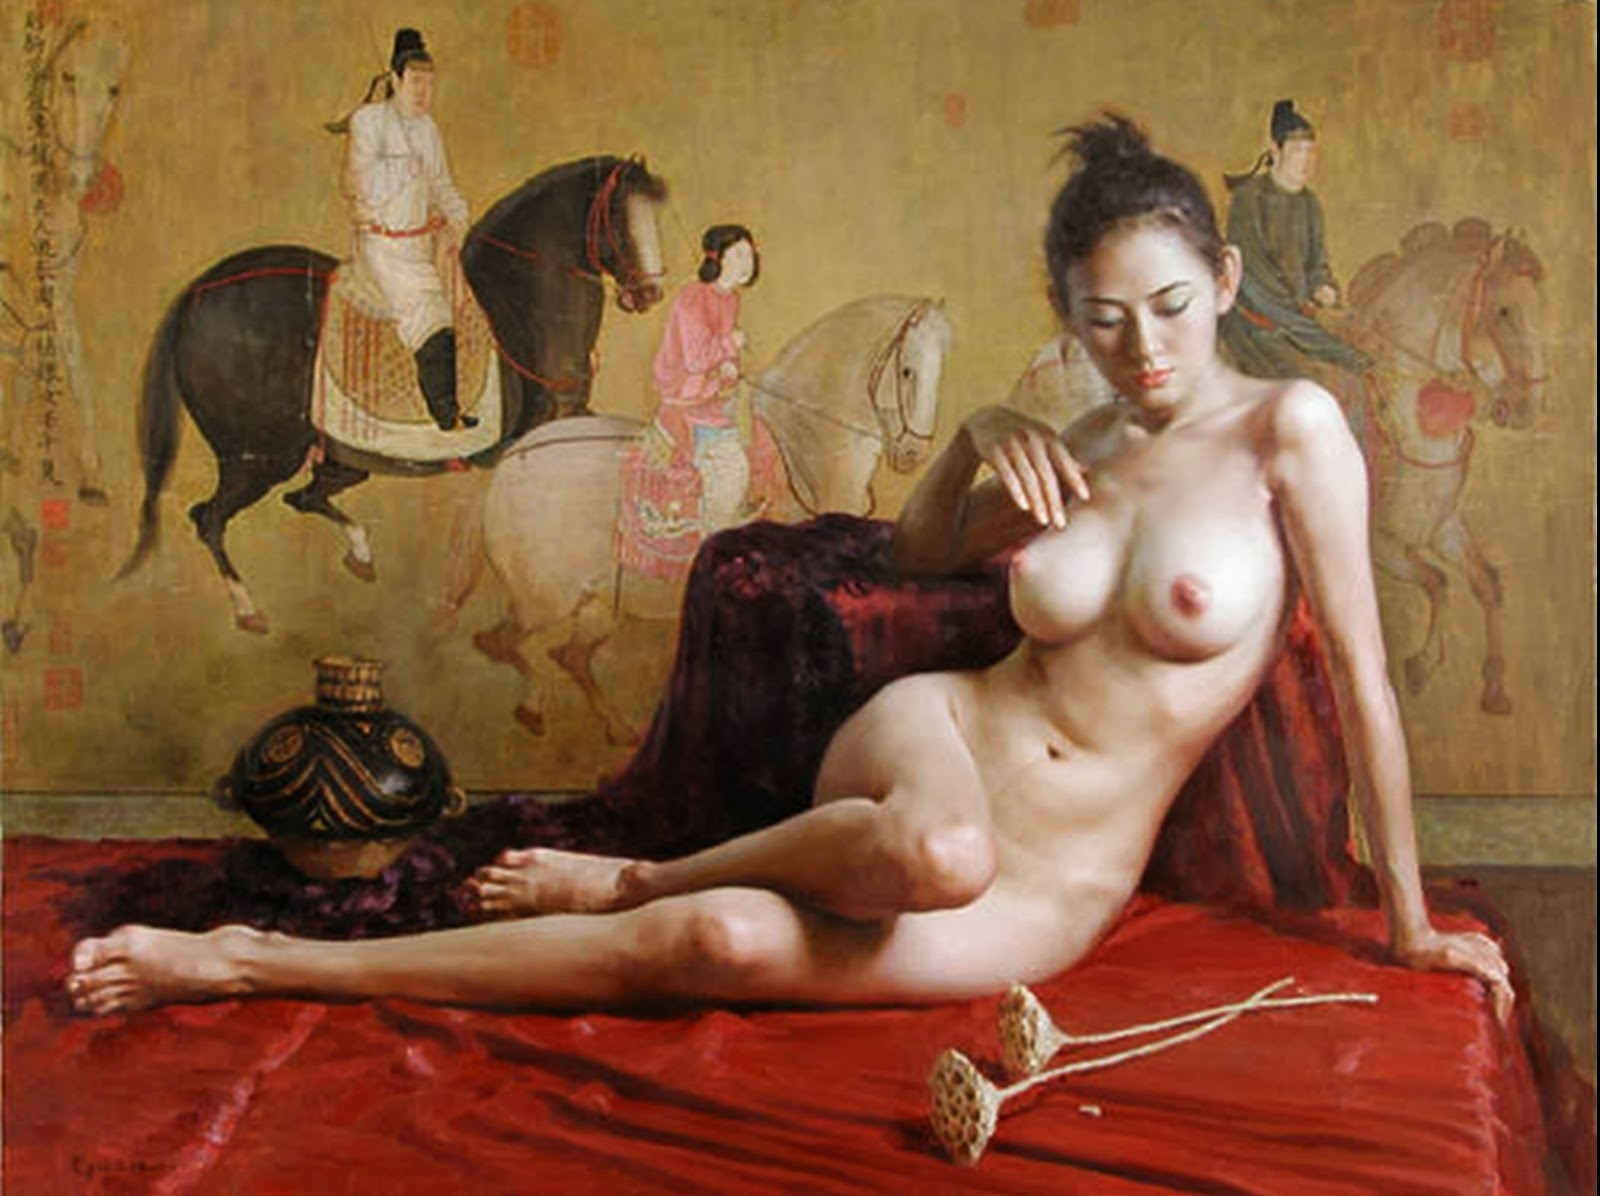 Arte exótico y erótico de guan zeju 5